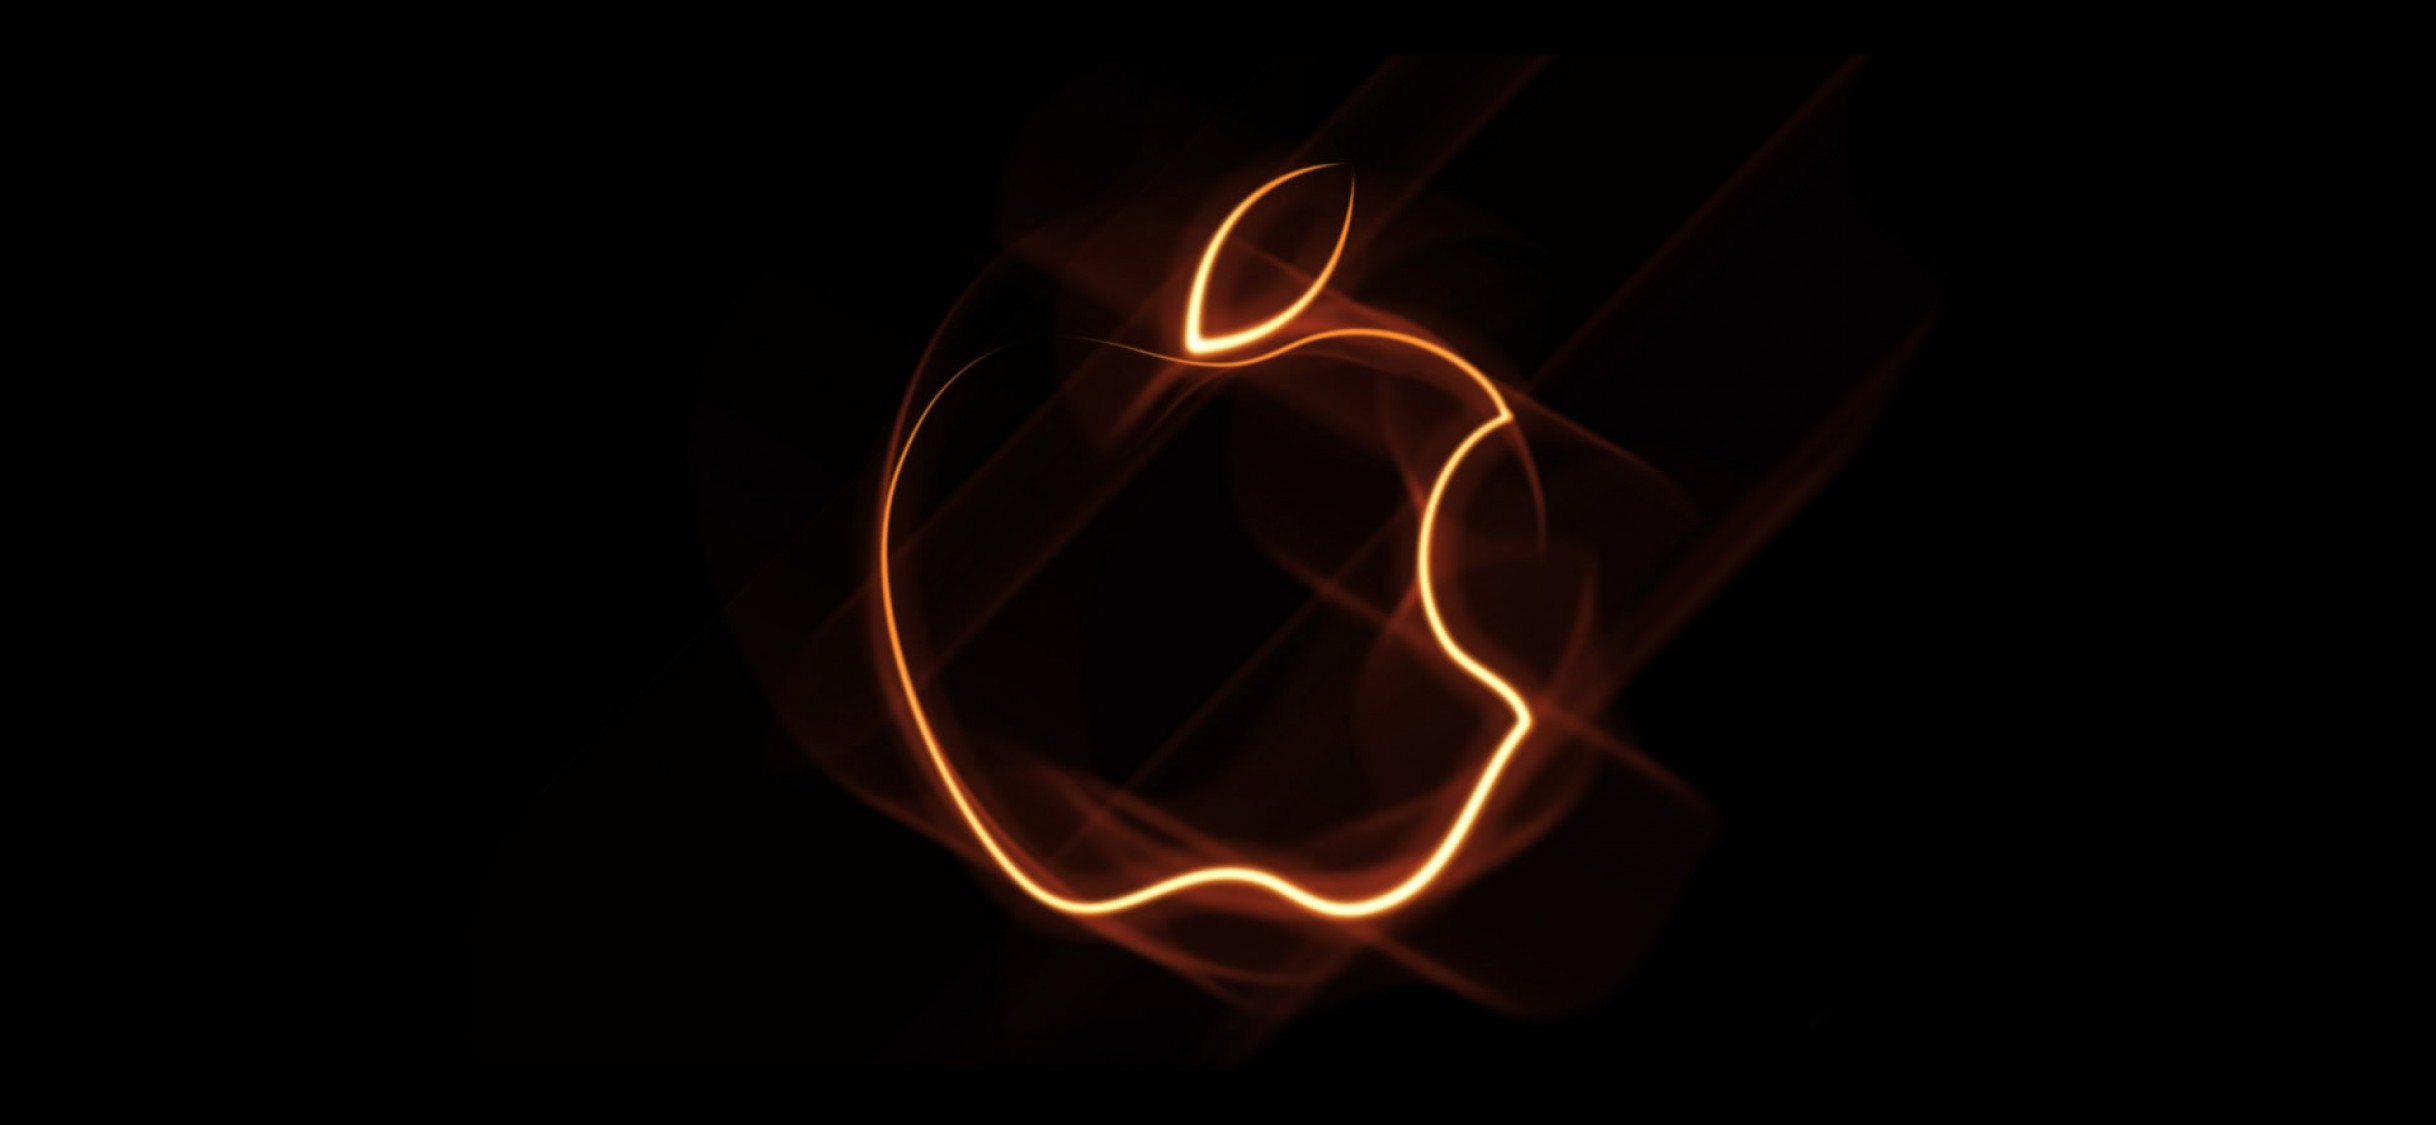 Orange Outline Apple Logo Wallpaper For Desktop And Mobiles